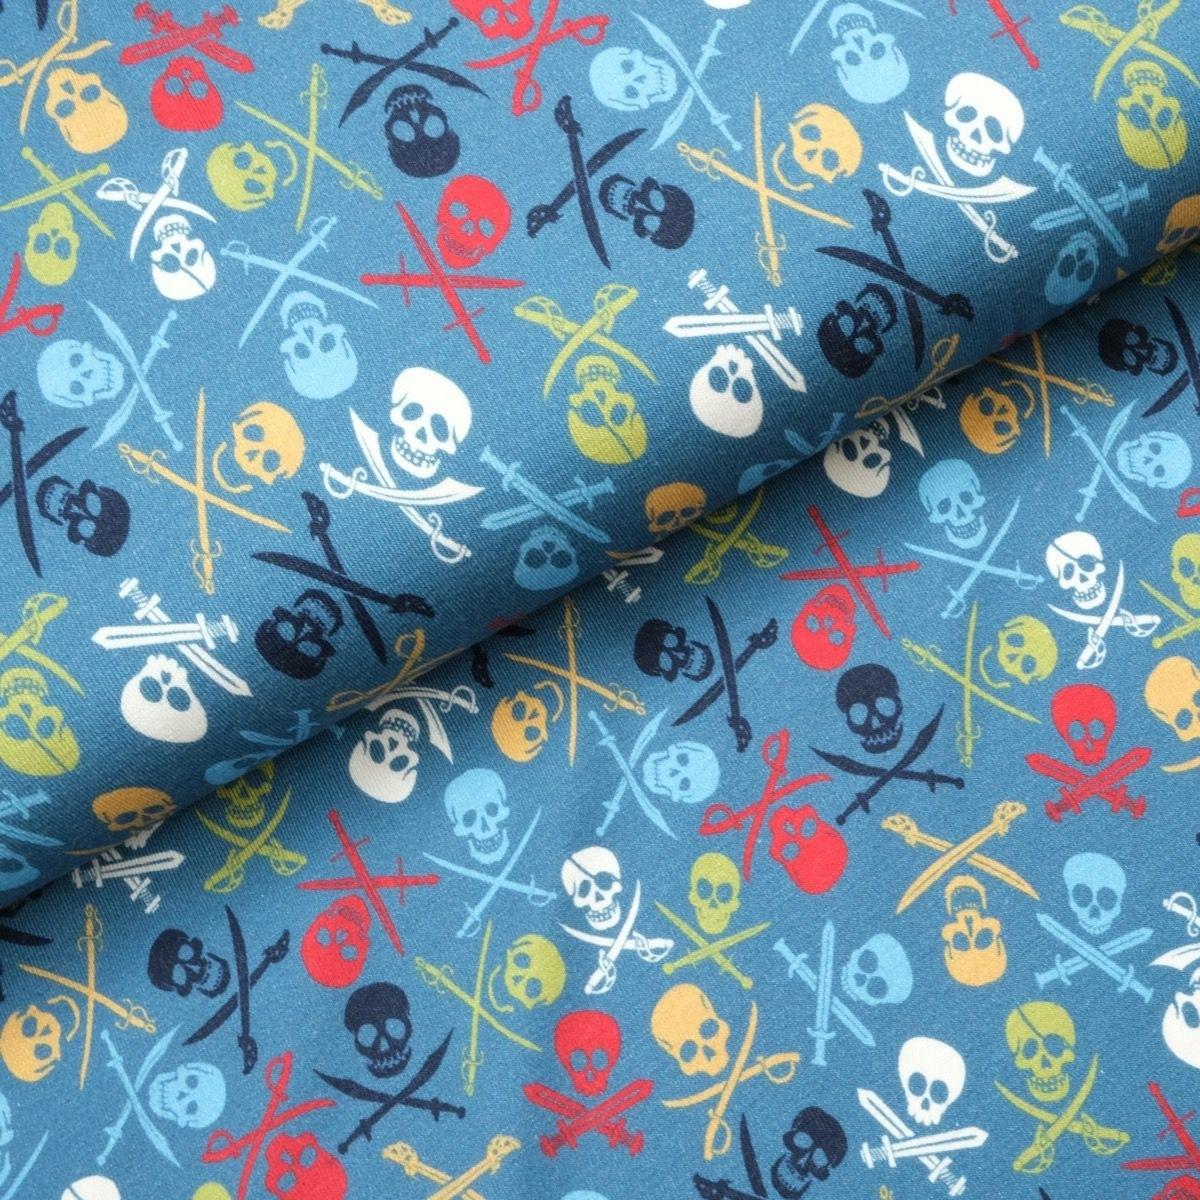 Baumwolljersey - Jersey Stoff - Motivjersey - Totenköpfe auf Jeans Reststück 100cm